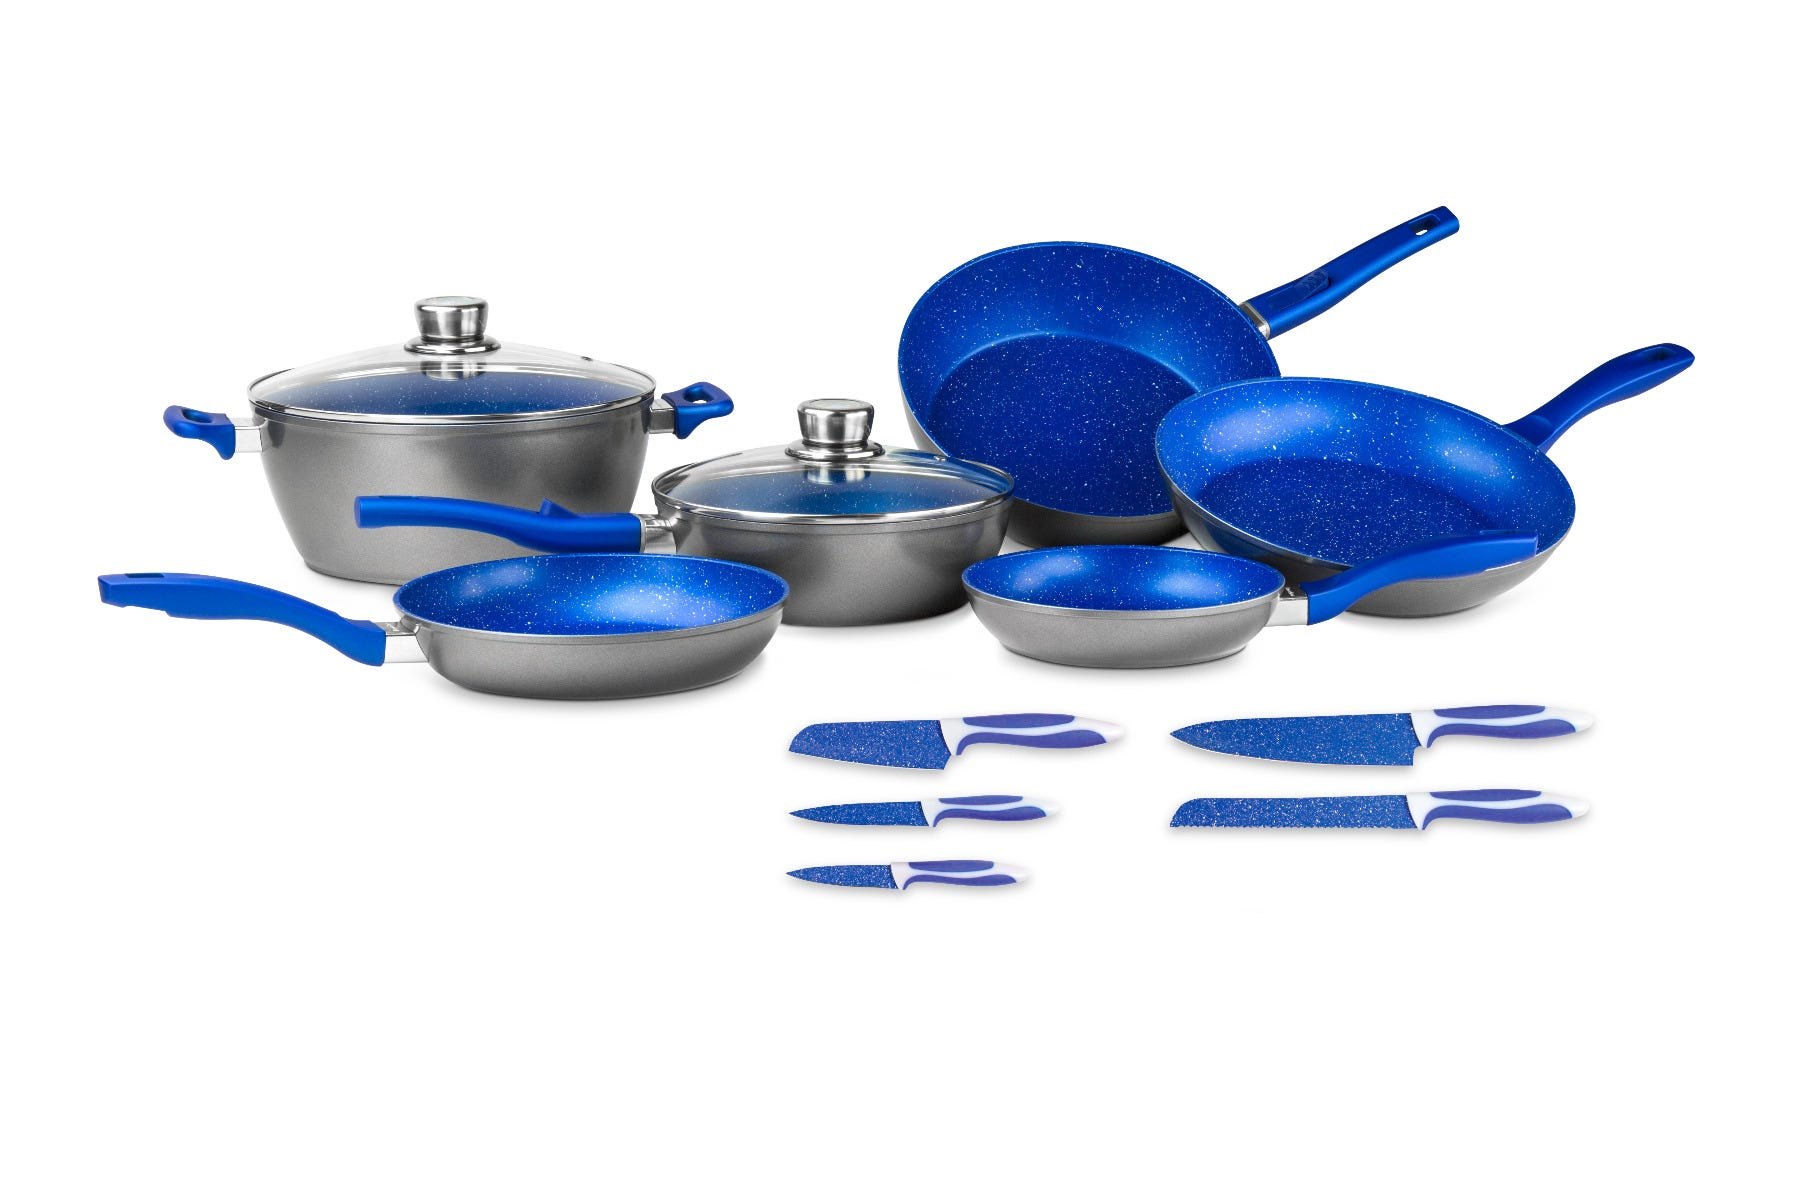 Batería Flavorstone® Family Set en azul, 13 piezas